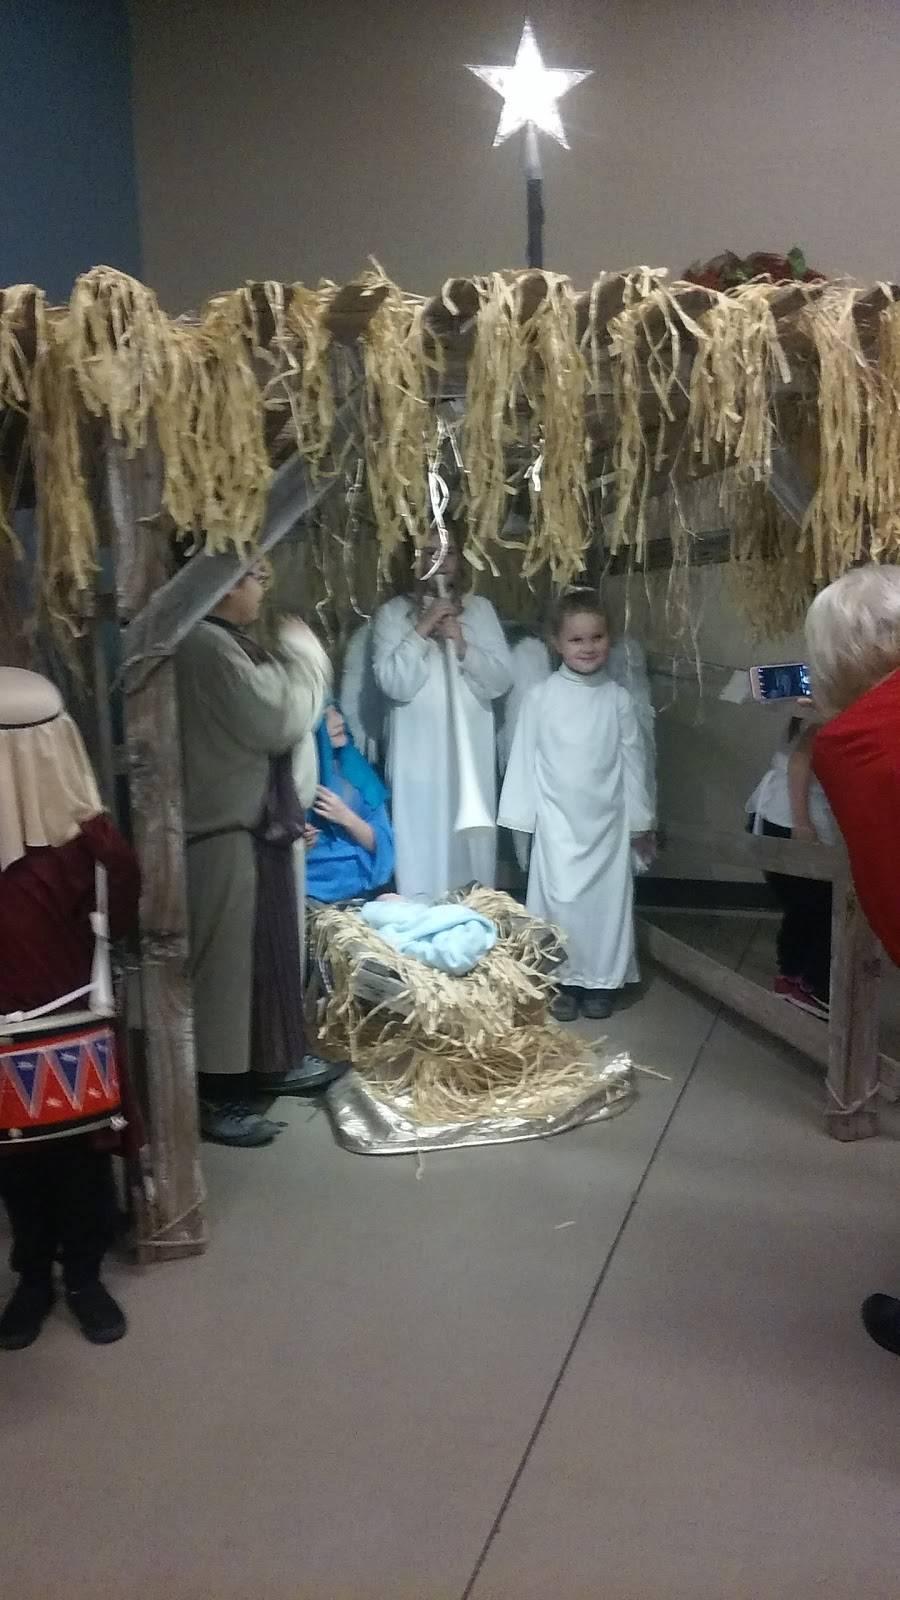 New Foundation Church - church  | Photo 6 of 9 | Address: 122 N Litchfield Rd, Goodyear, AZ 85338, USA | Phone: (623) 444-9762